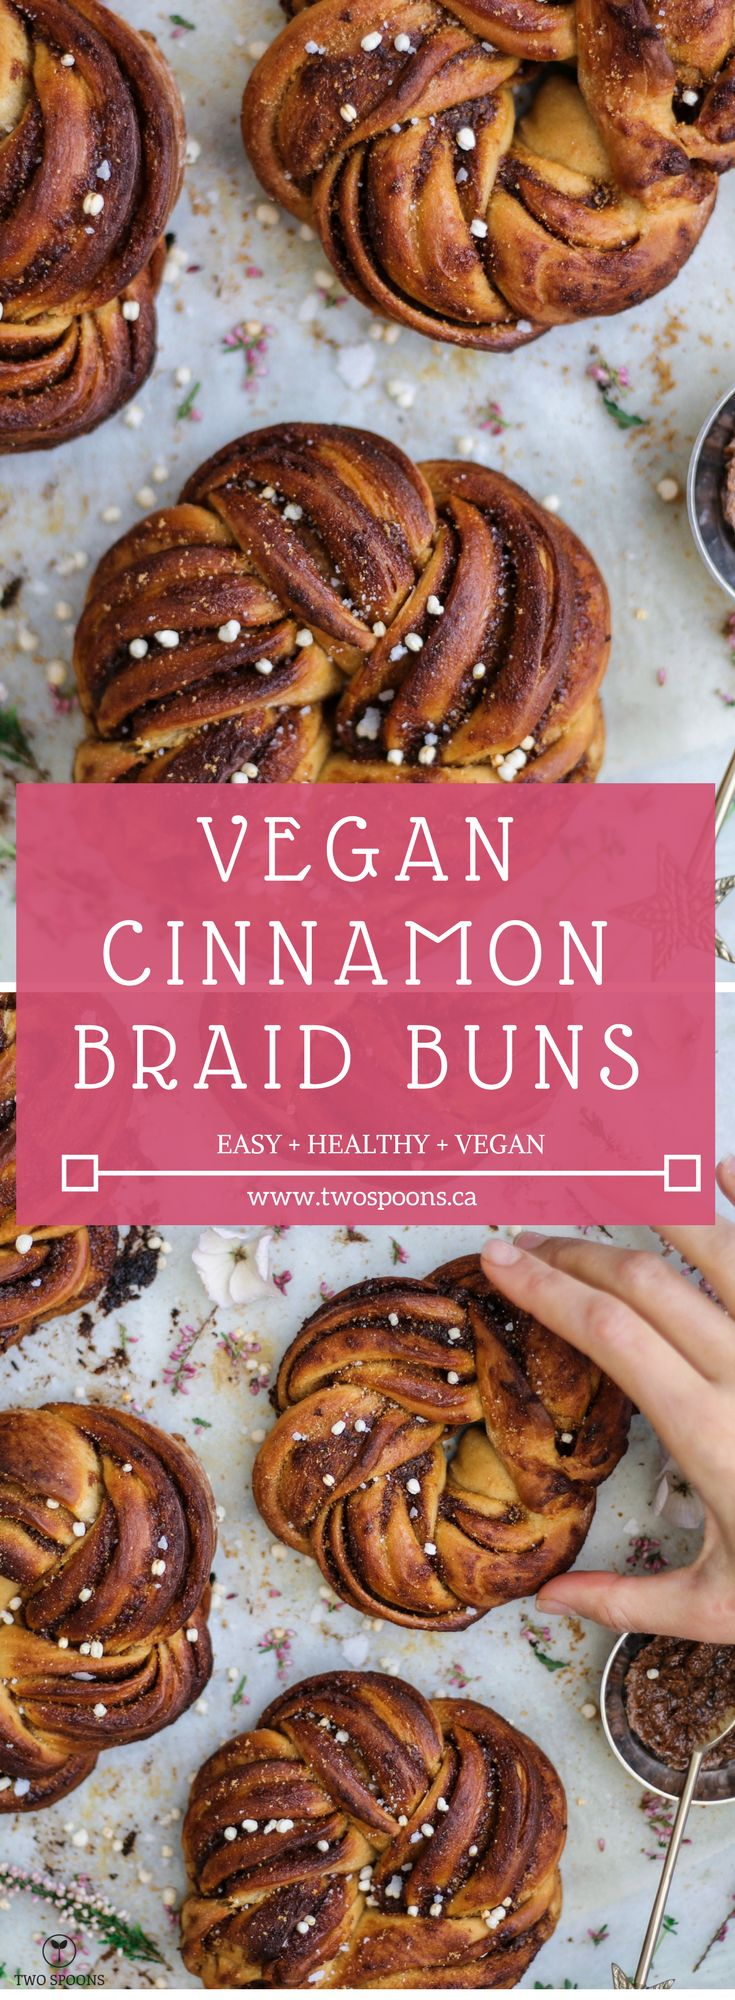 VEGAN CINNAMON BUNS | Easy, Vegan, Breakfast Recipes | TWO SPOONS